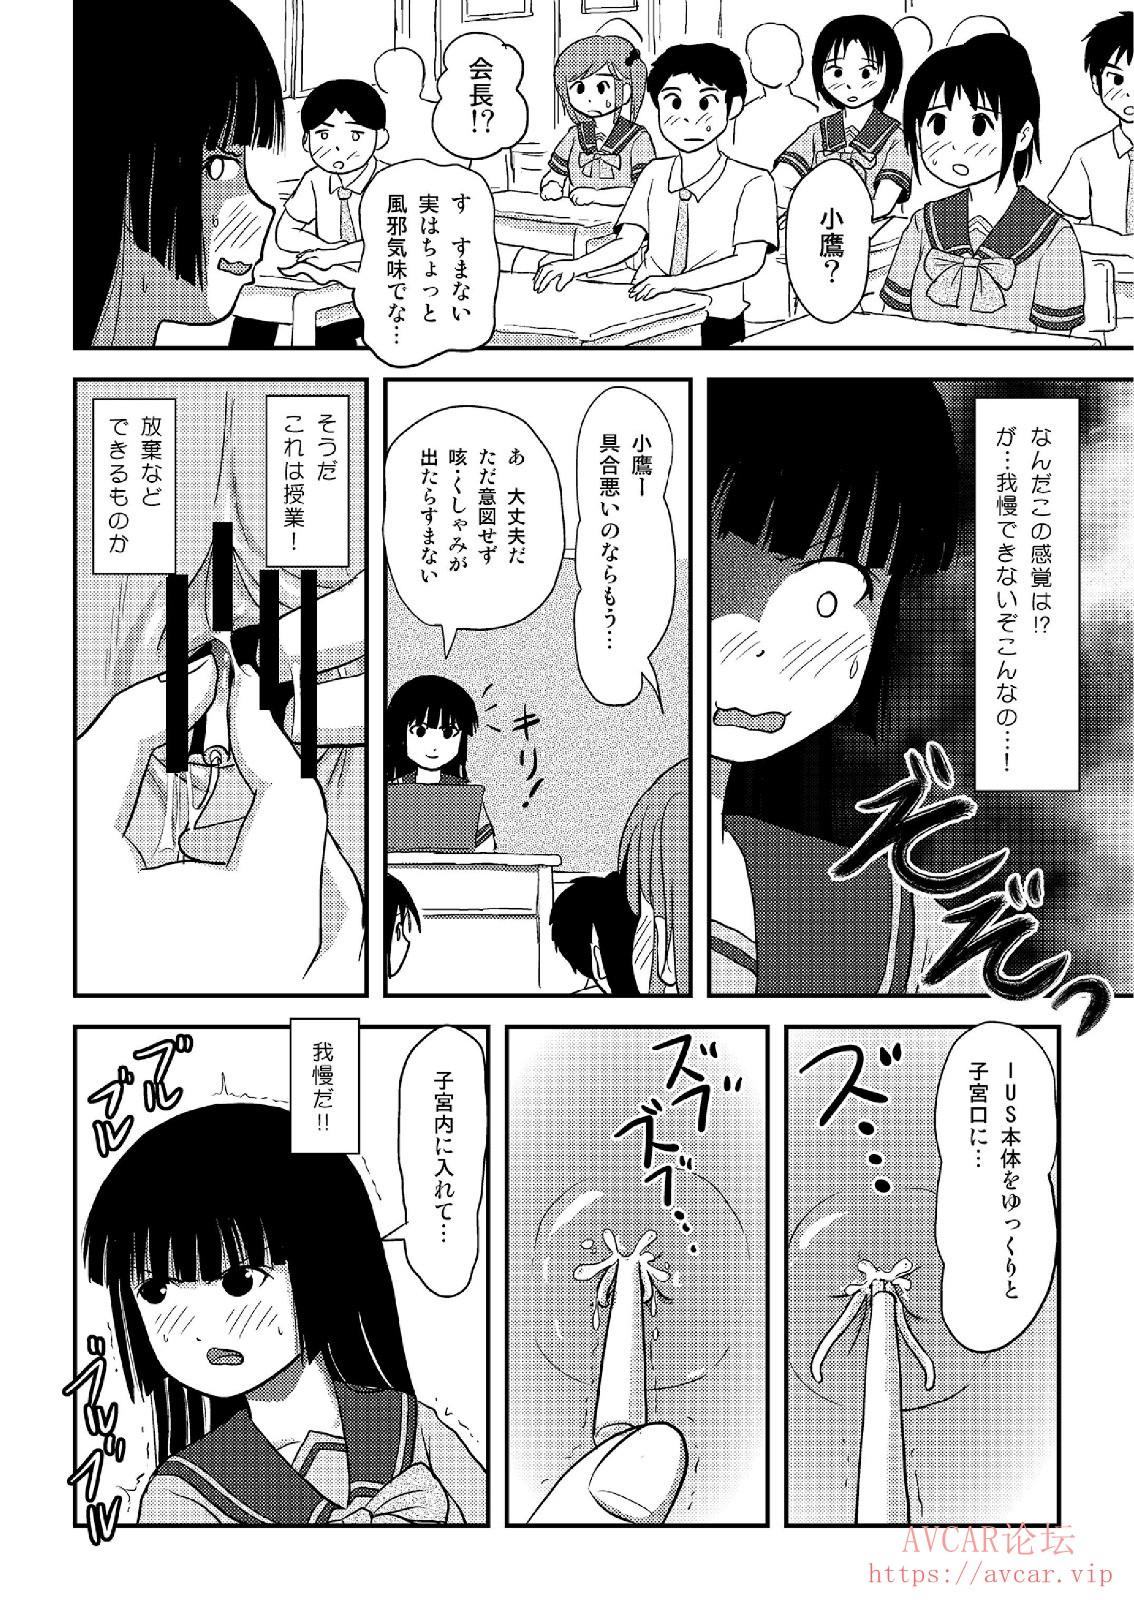 5_page_024.jpg